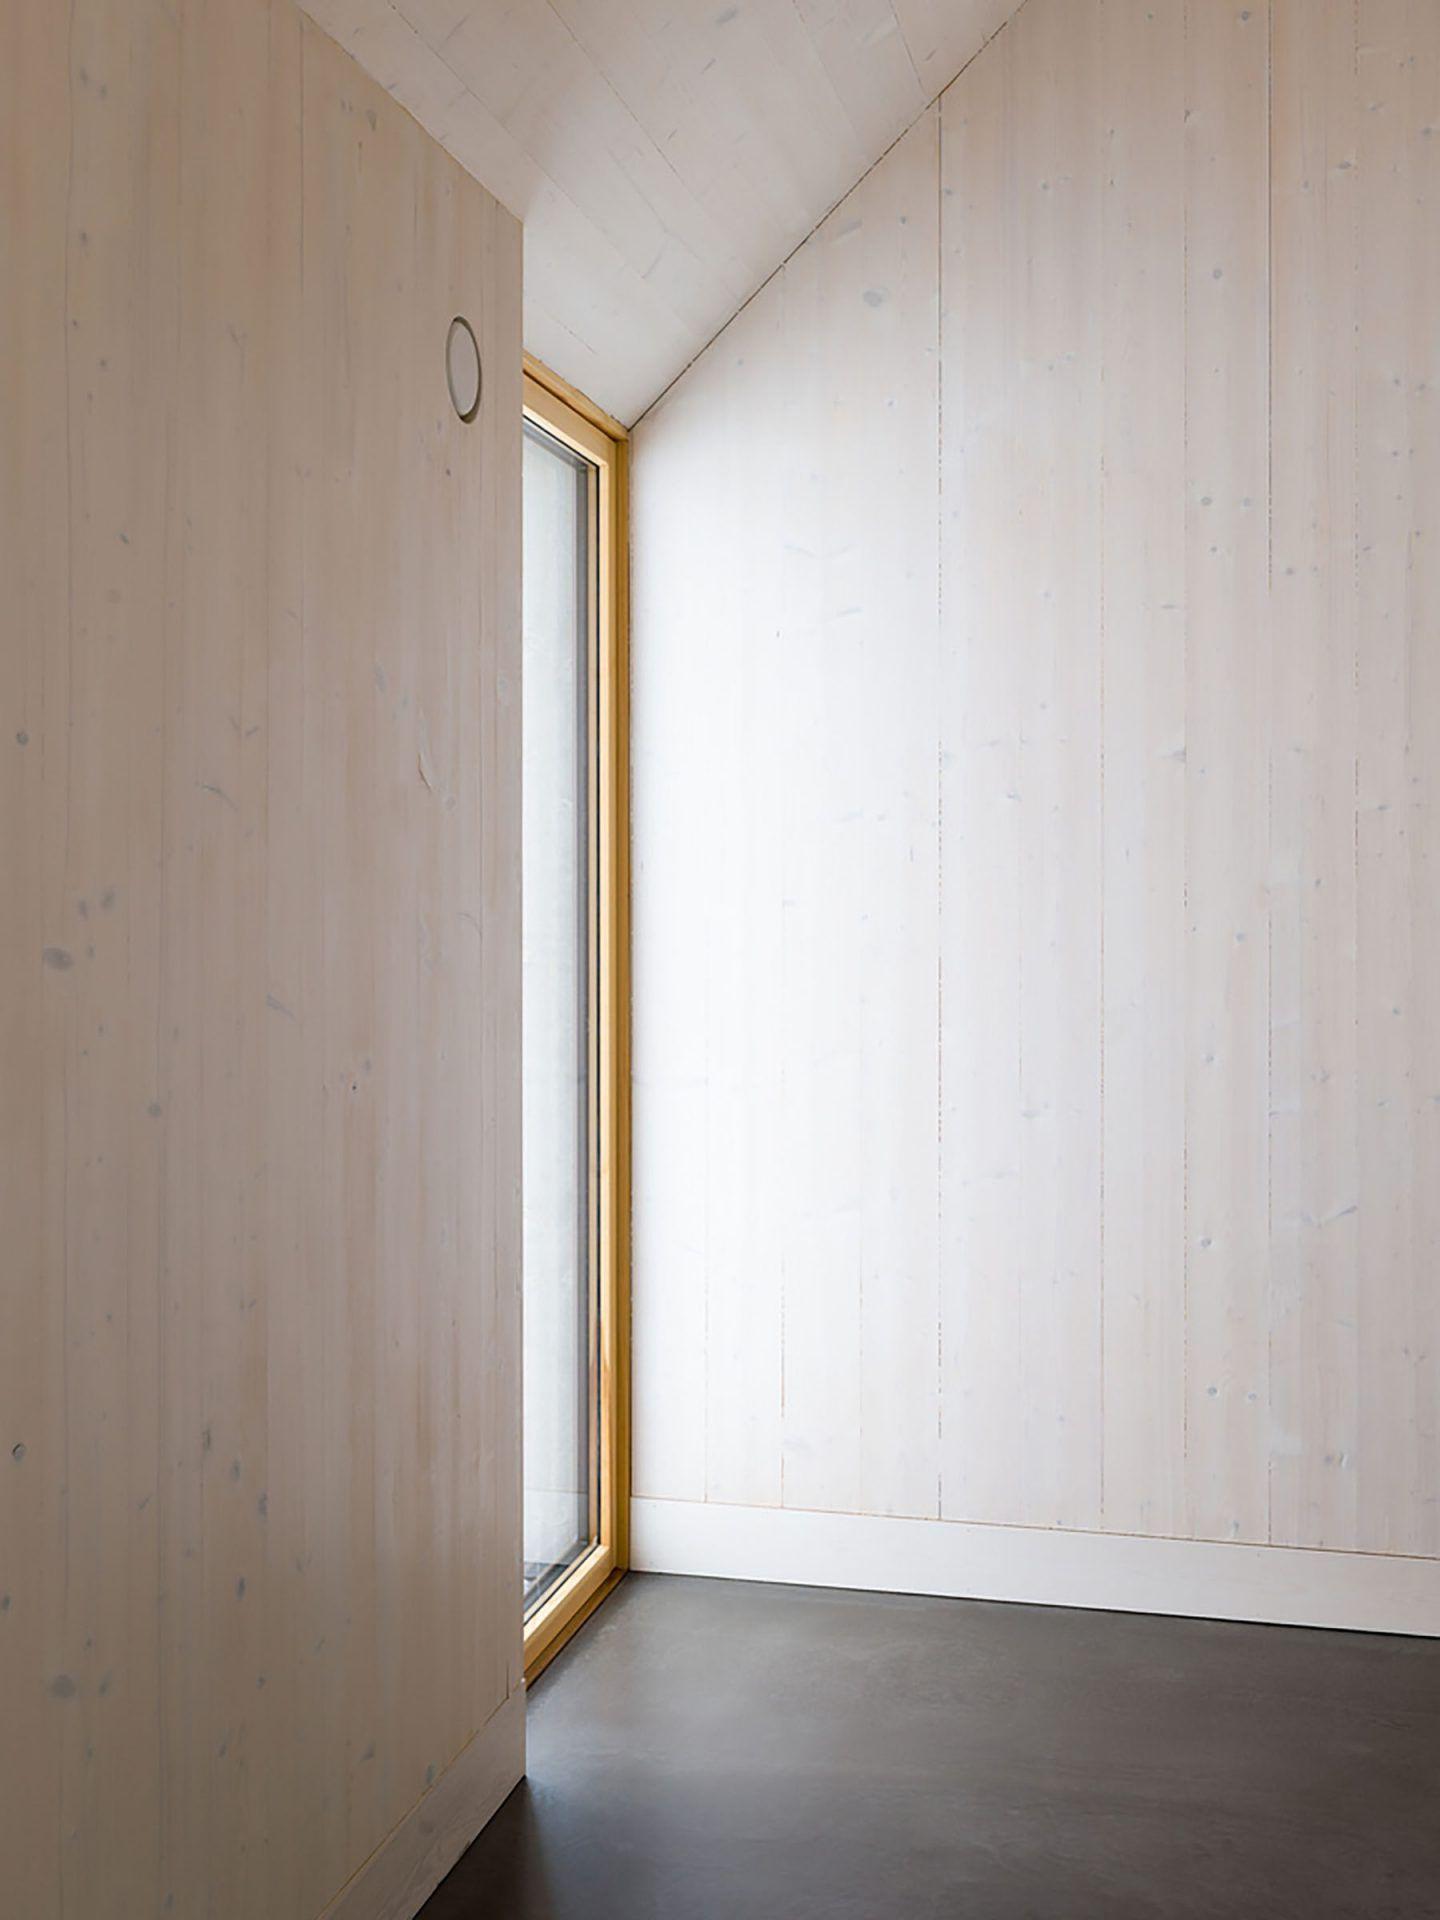 IGNANT-Architecture-Jim-Brunnestom-Dalsland-Cabin-2.0-14